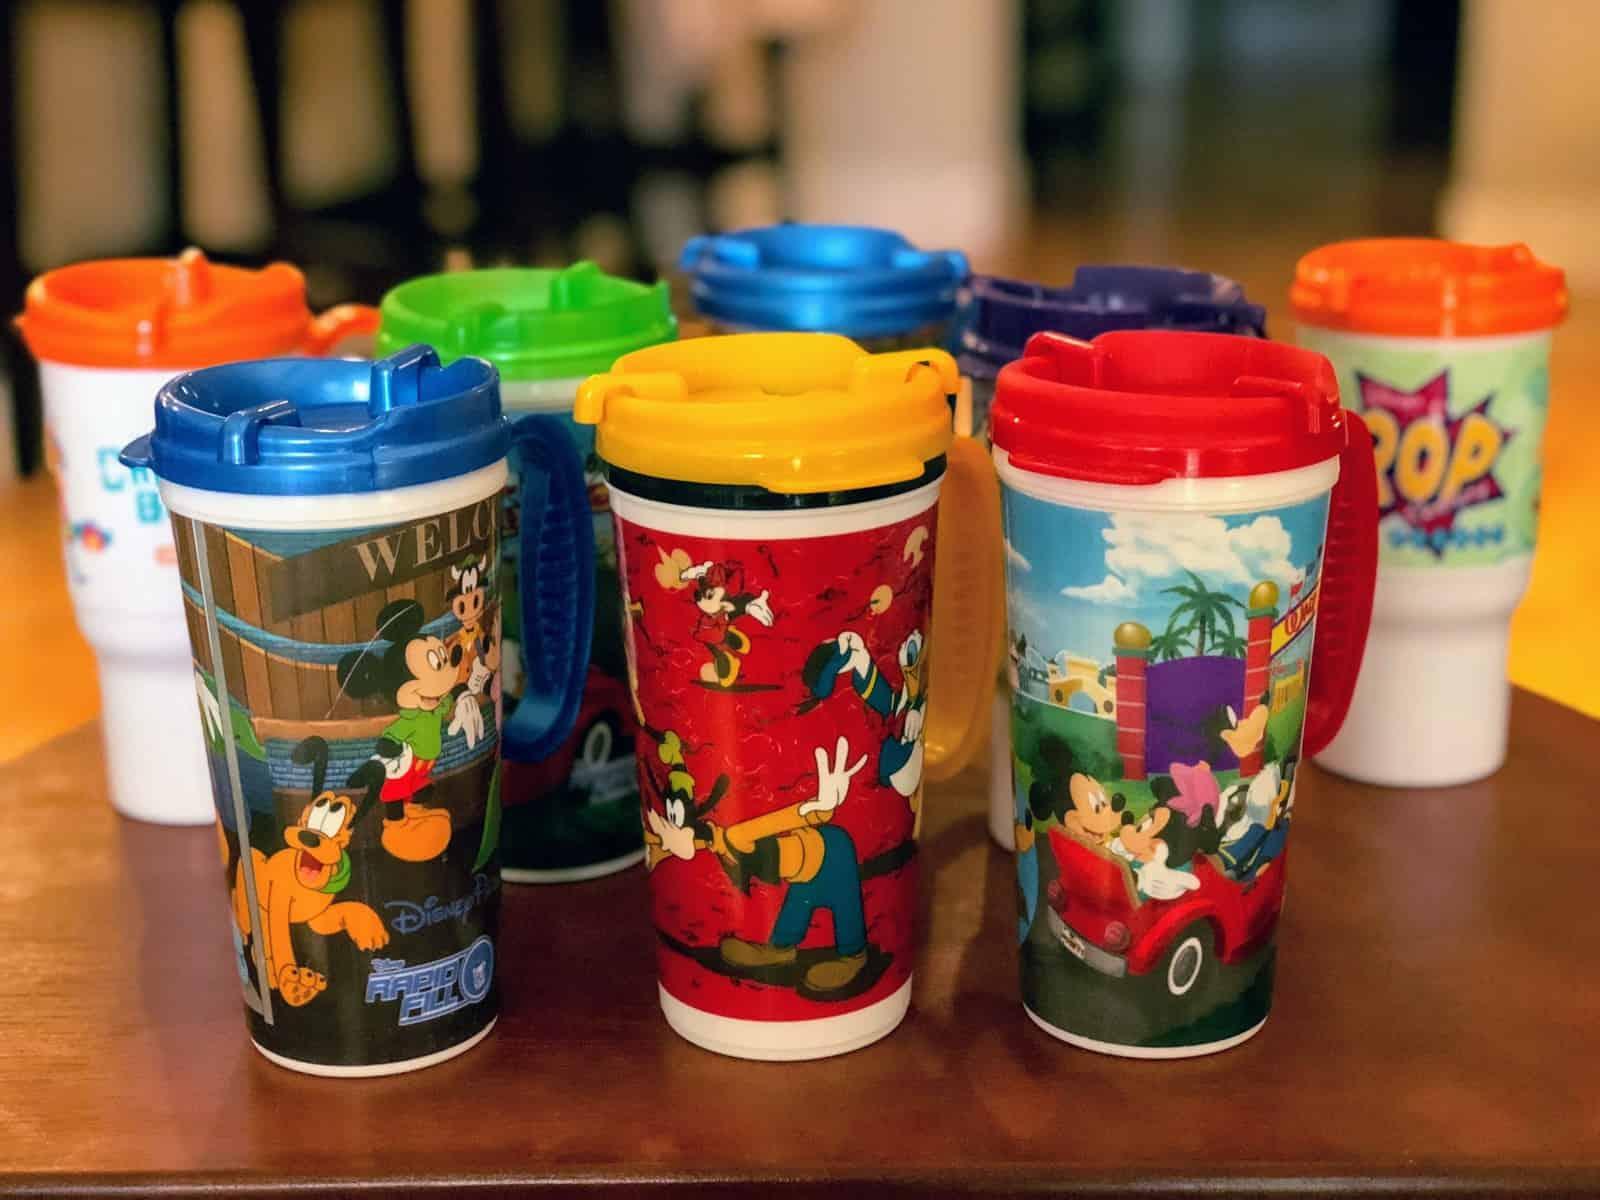 Disney refillable mugs